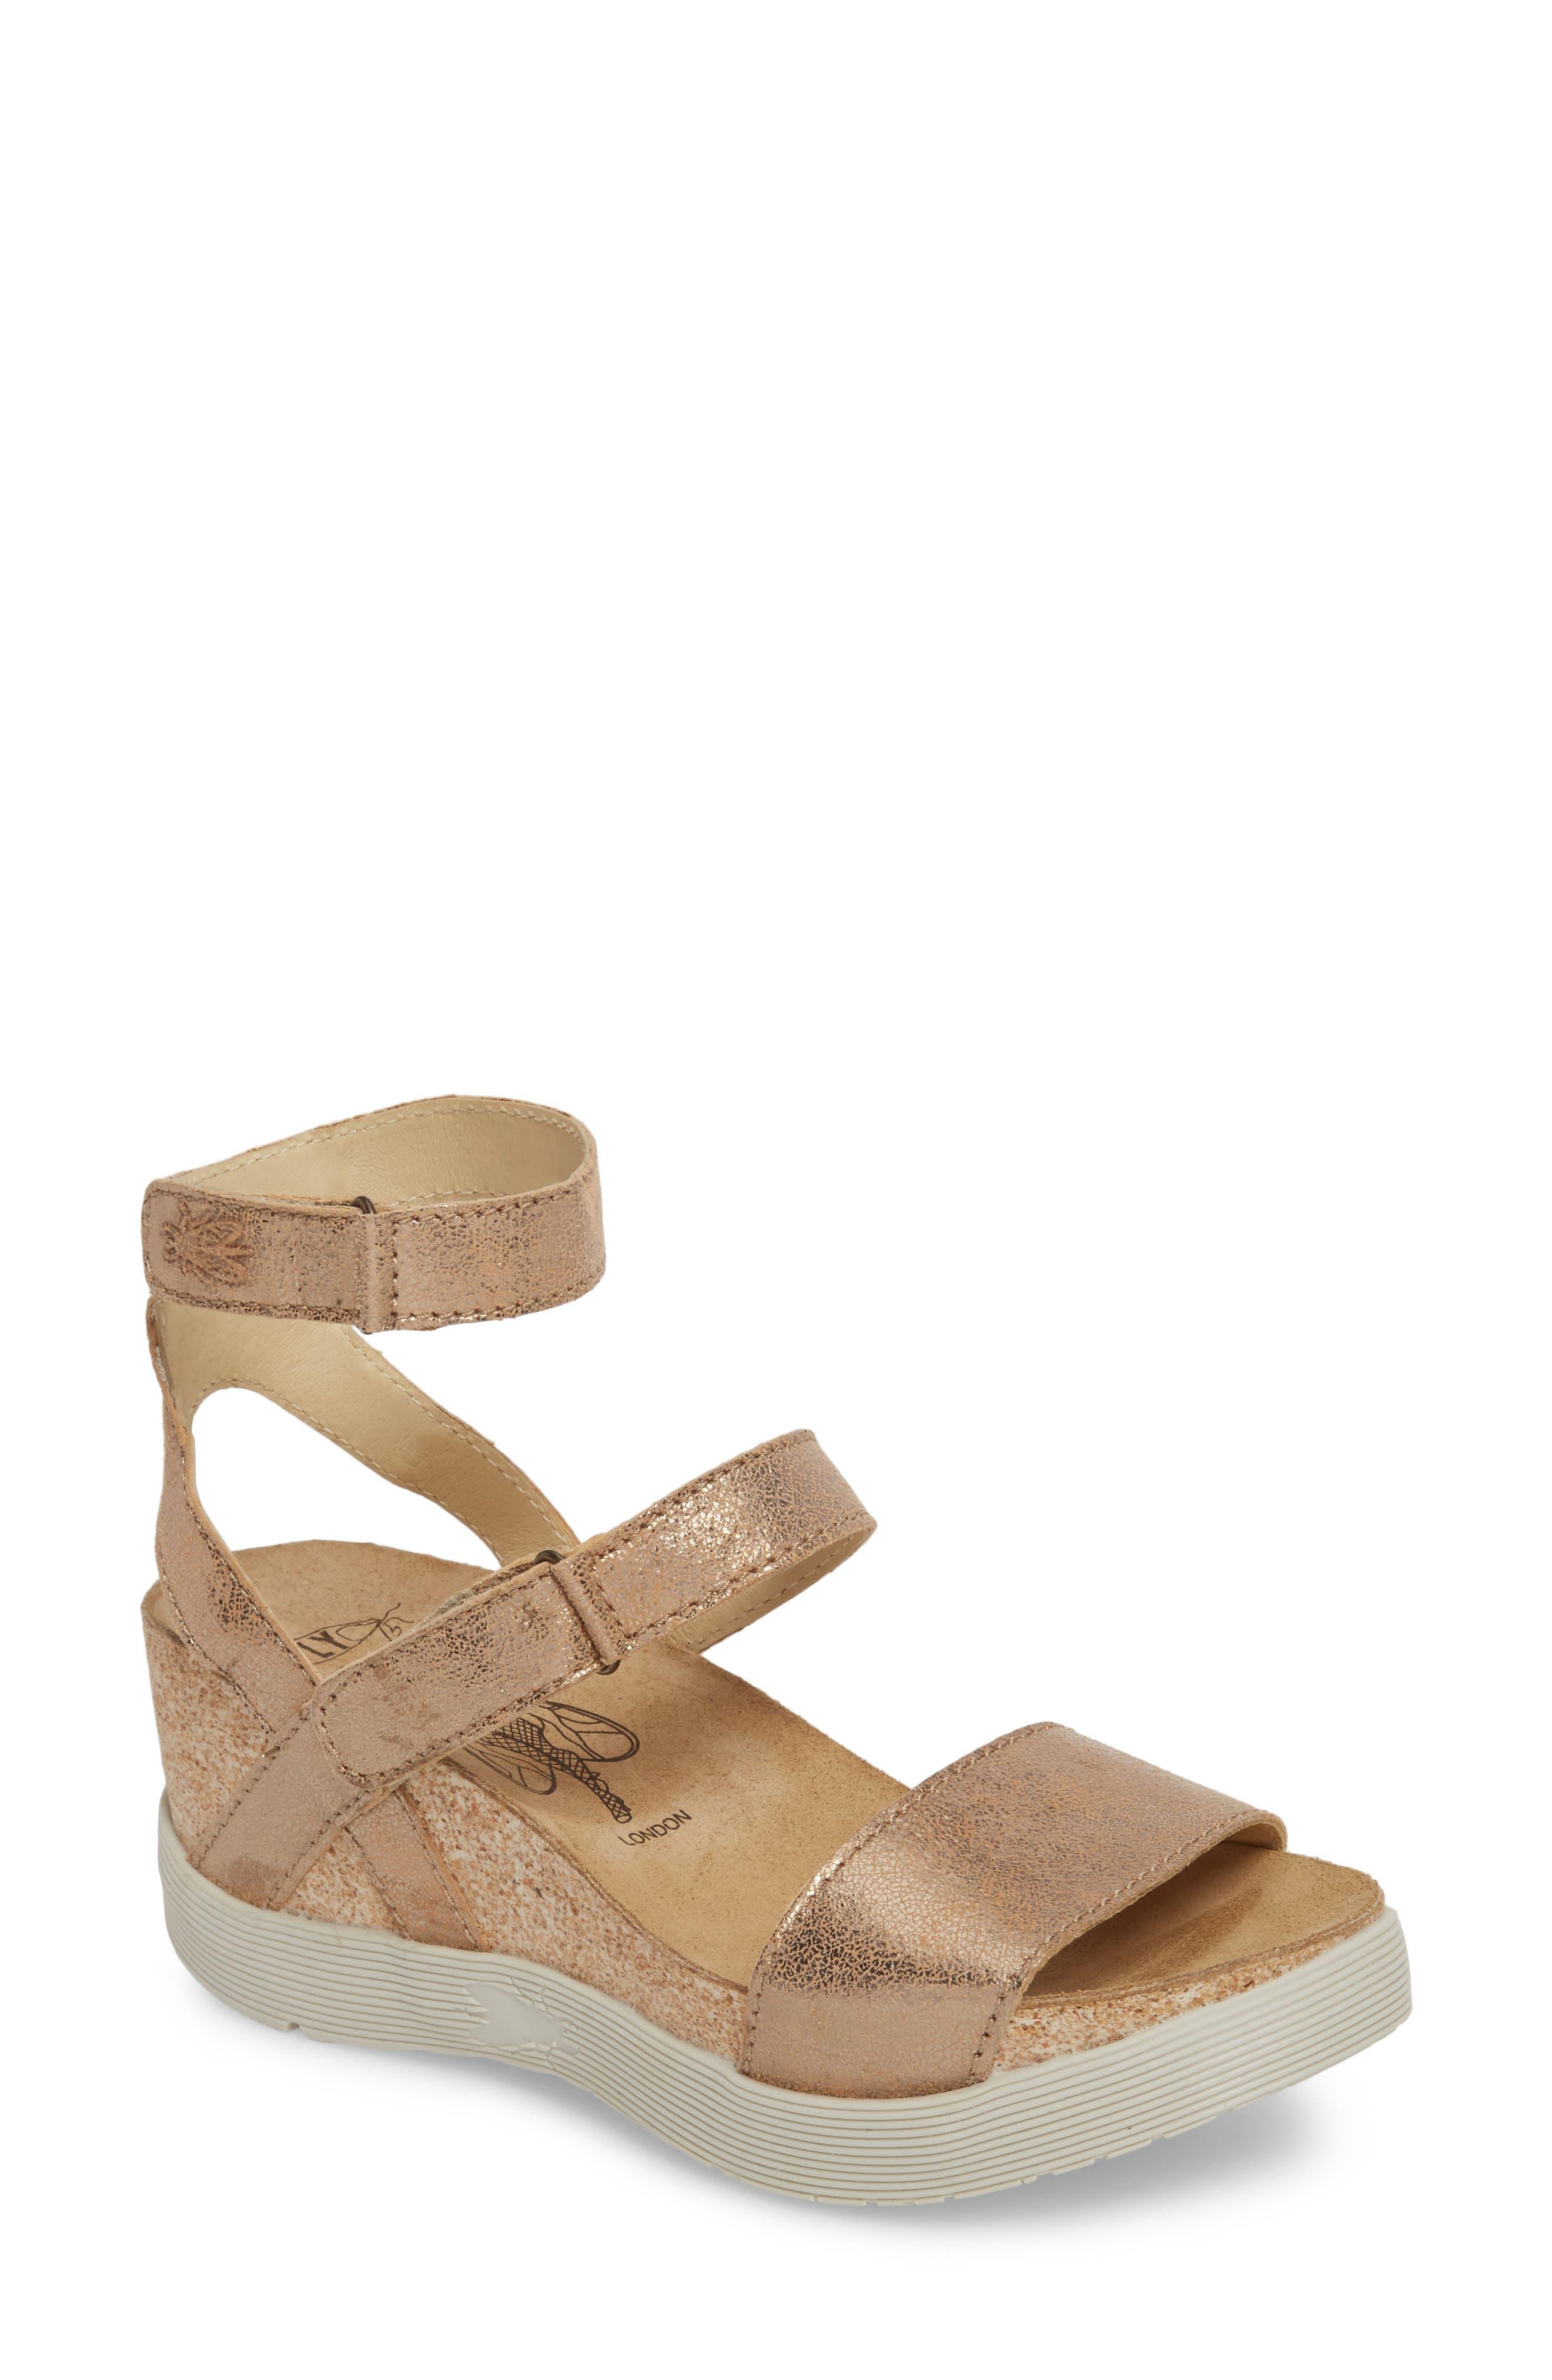 Main Image - Fly London Wink Platform Sandal (Women)